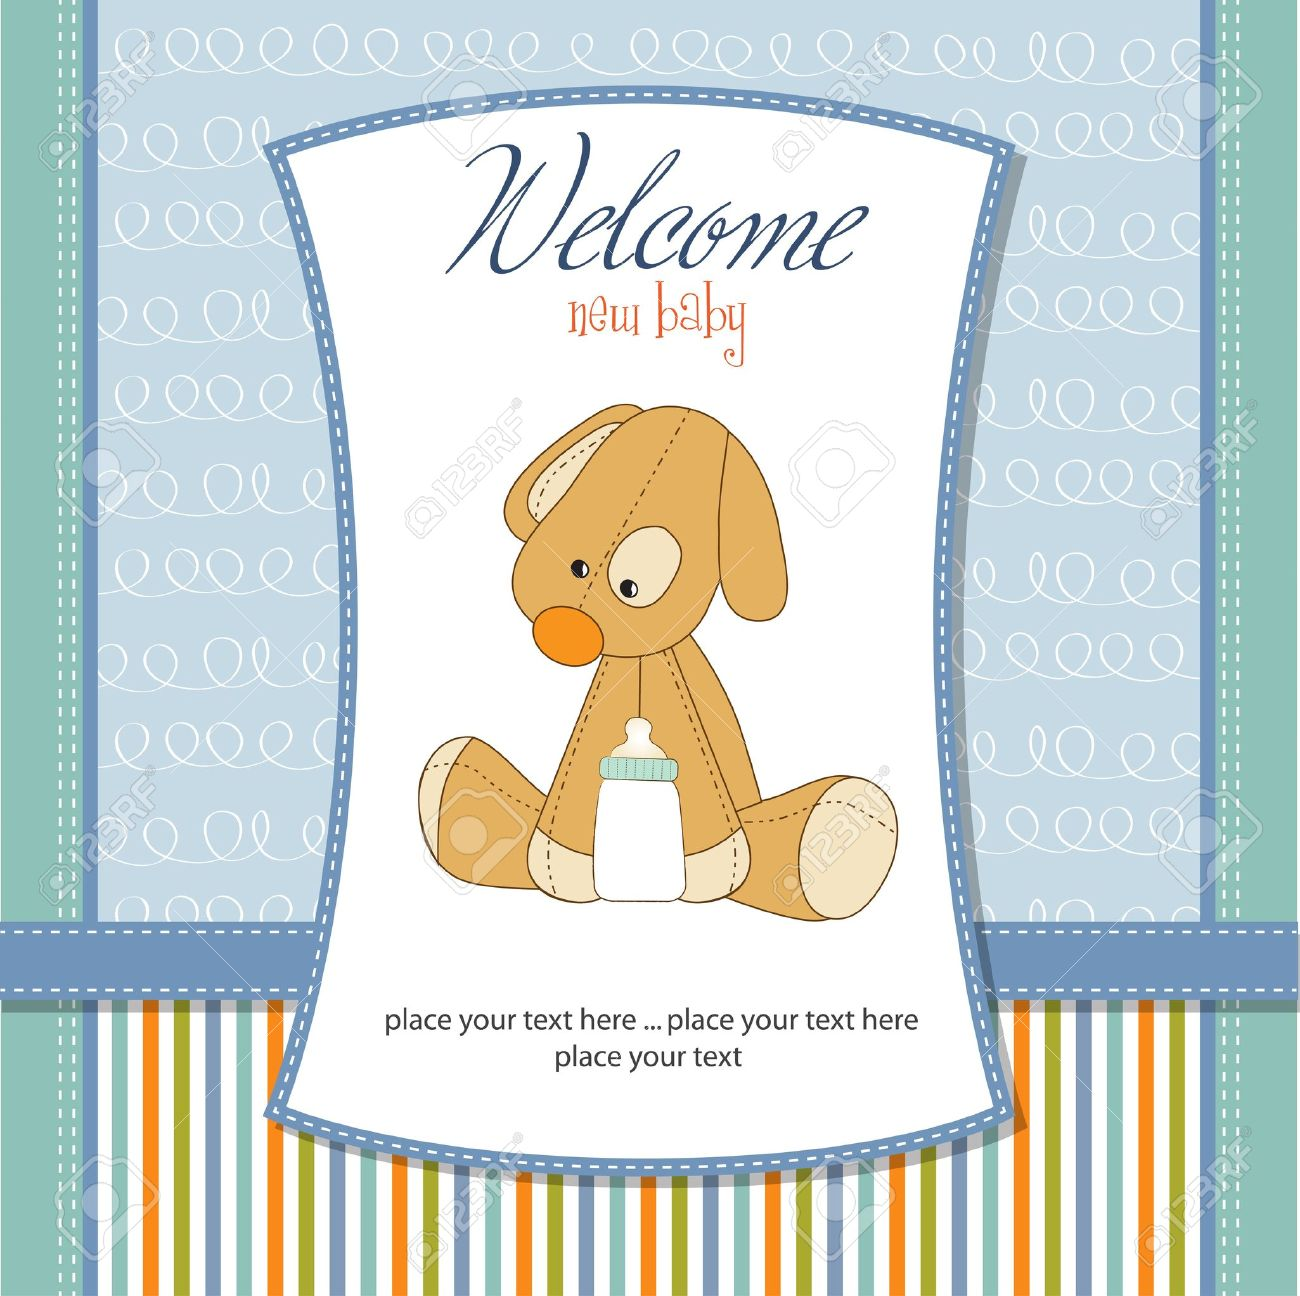 welcome new baby boy Stock Vector - 11132197